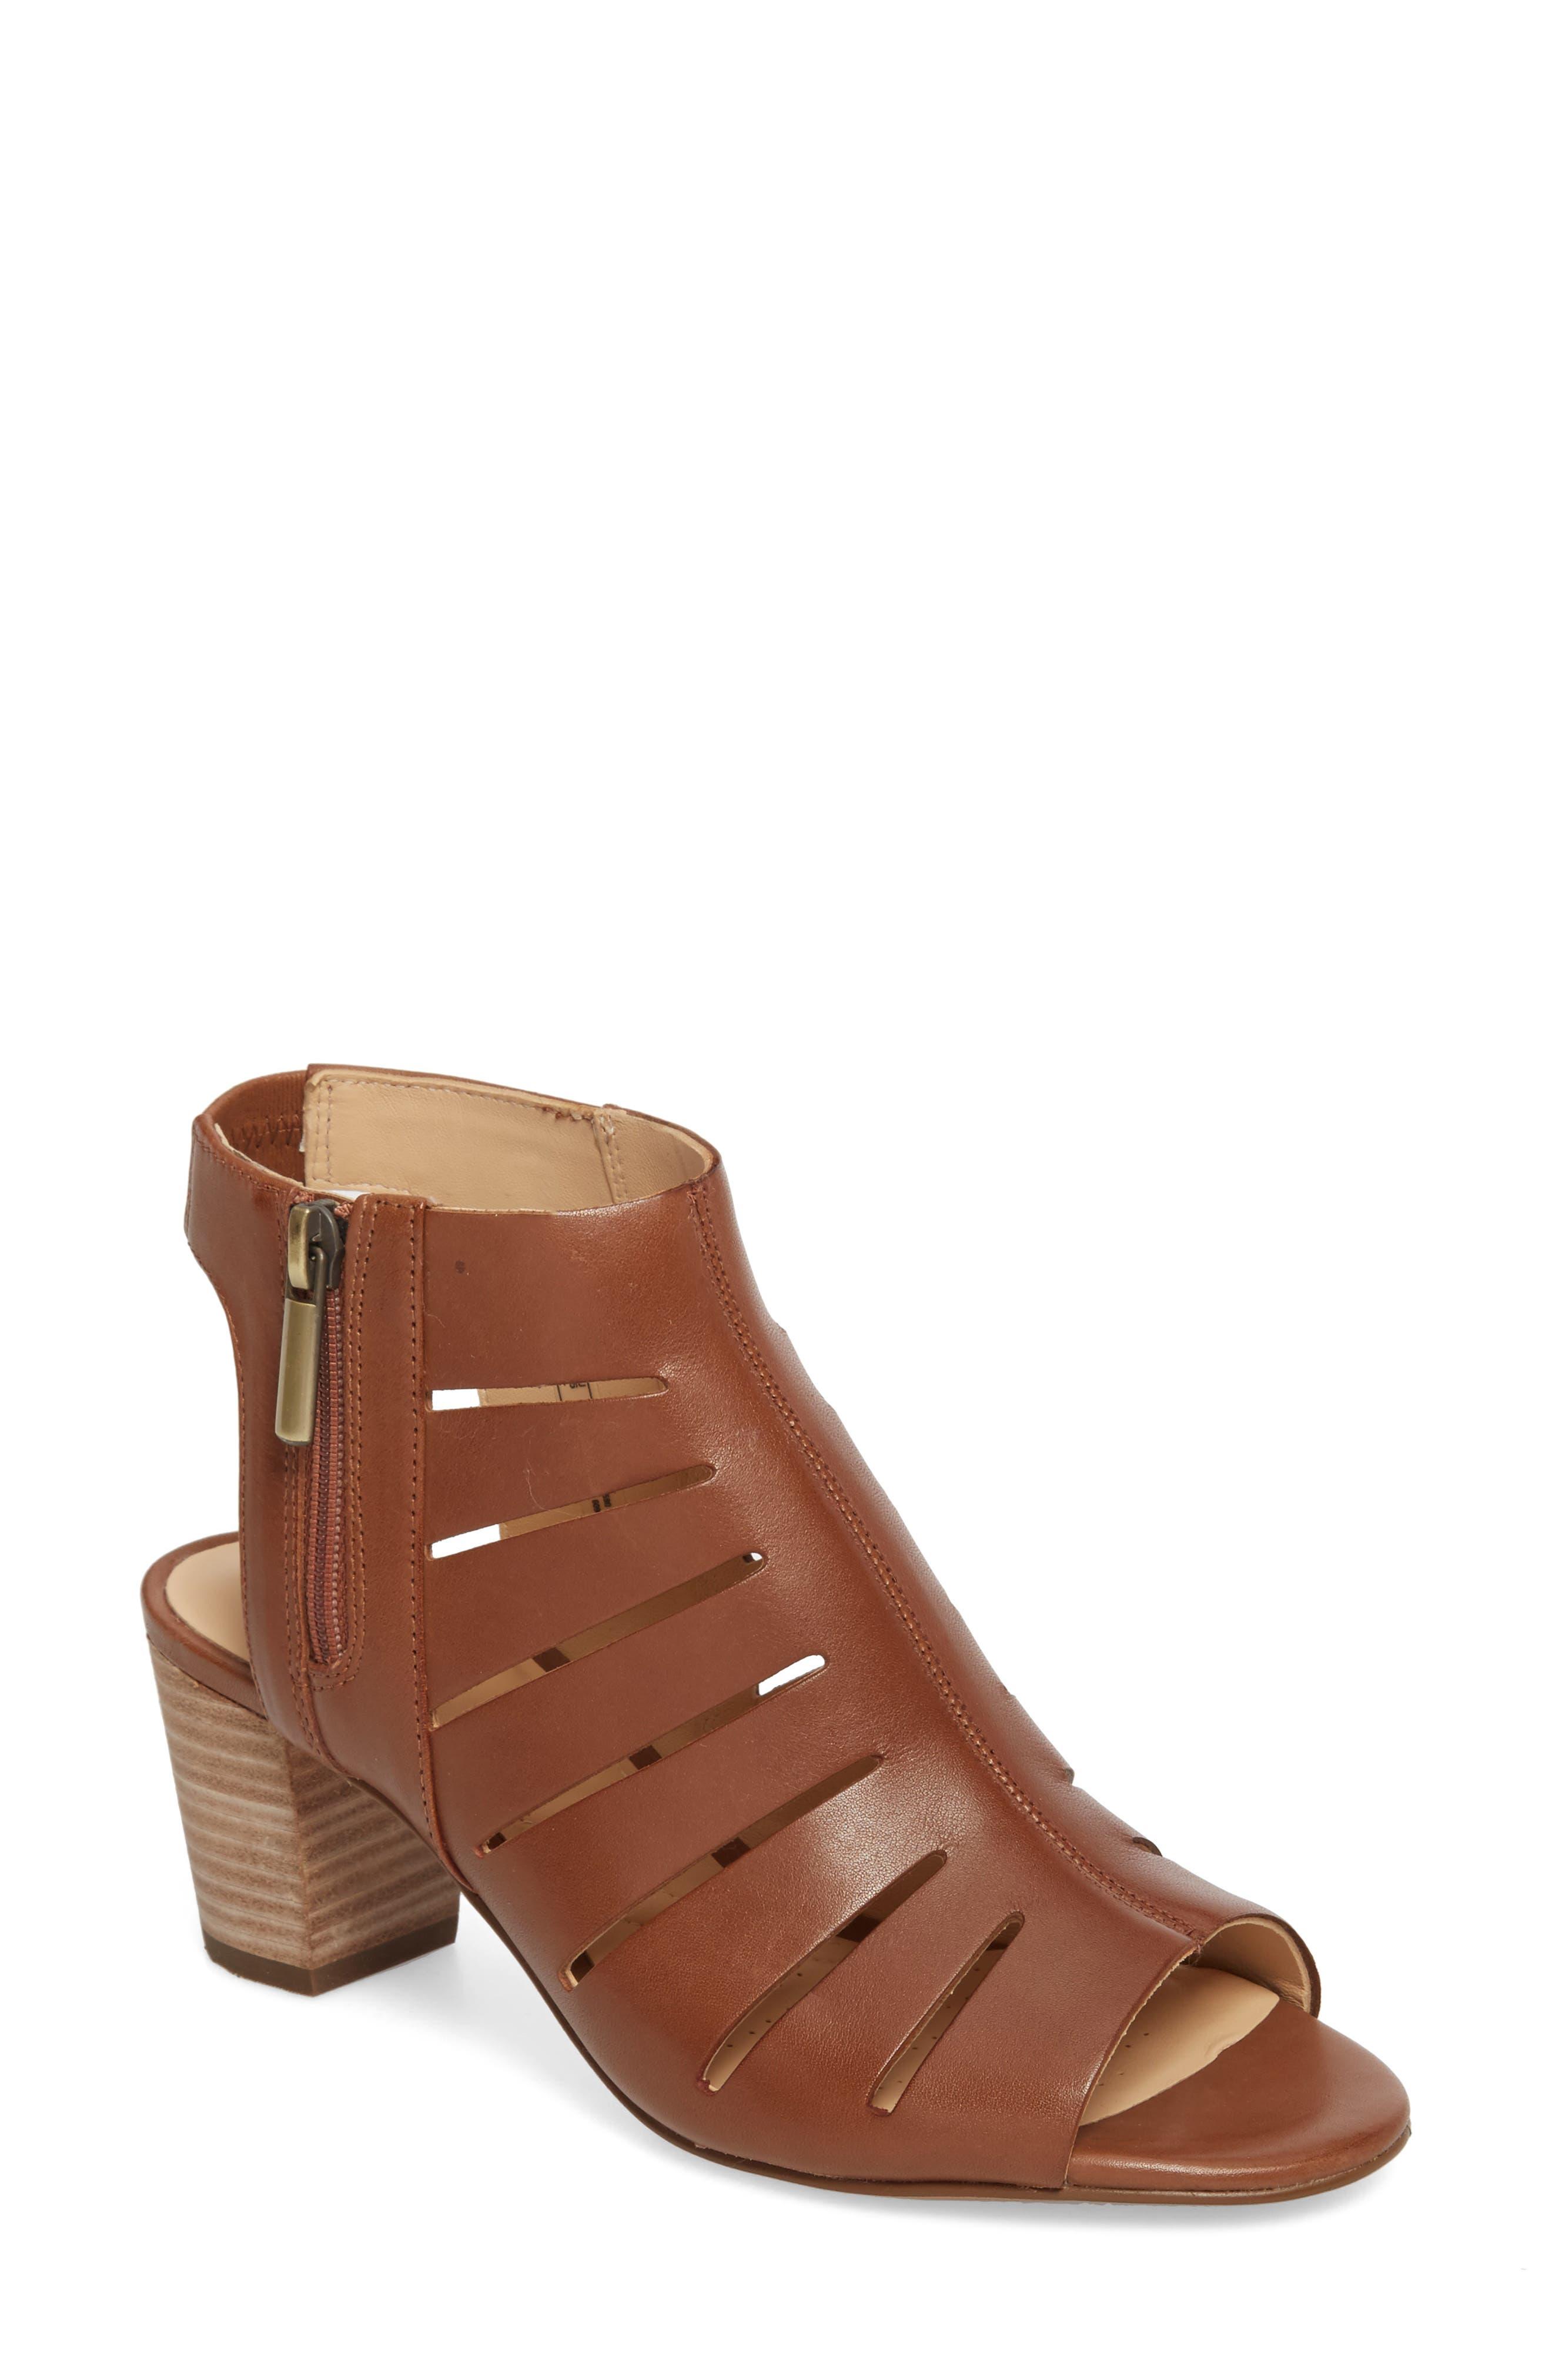 Deloria Ivy Sandal,                             Main thumbnail 1, color,                             Tan Leather